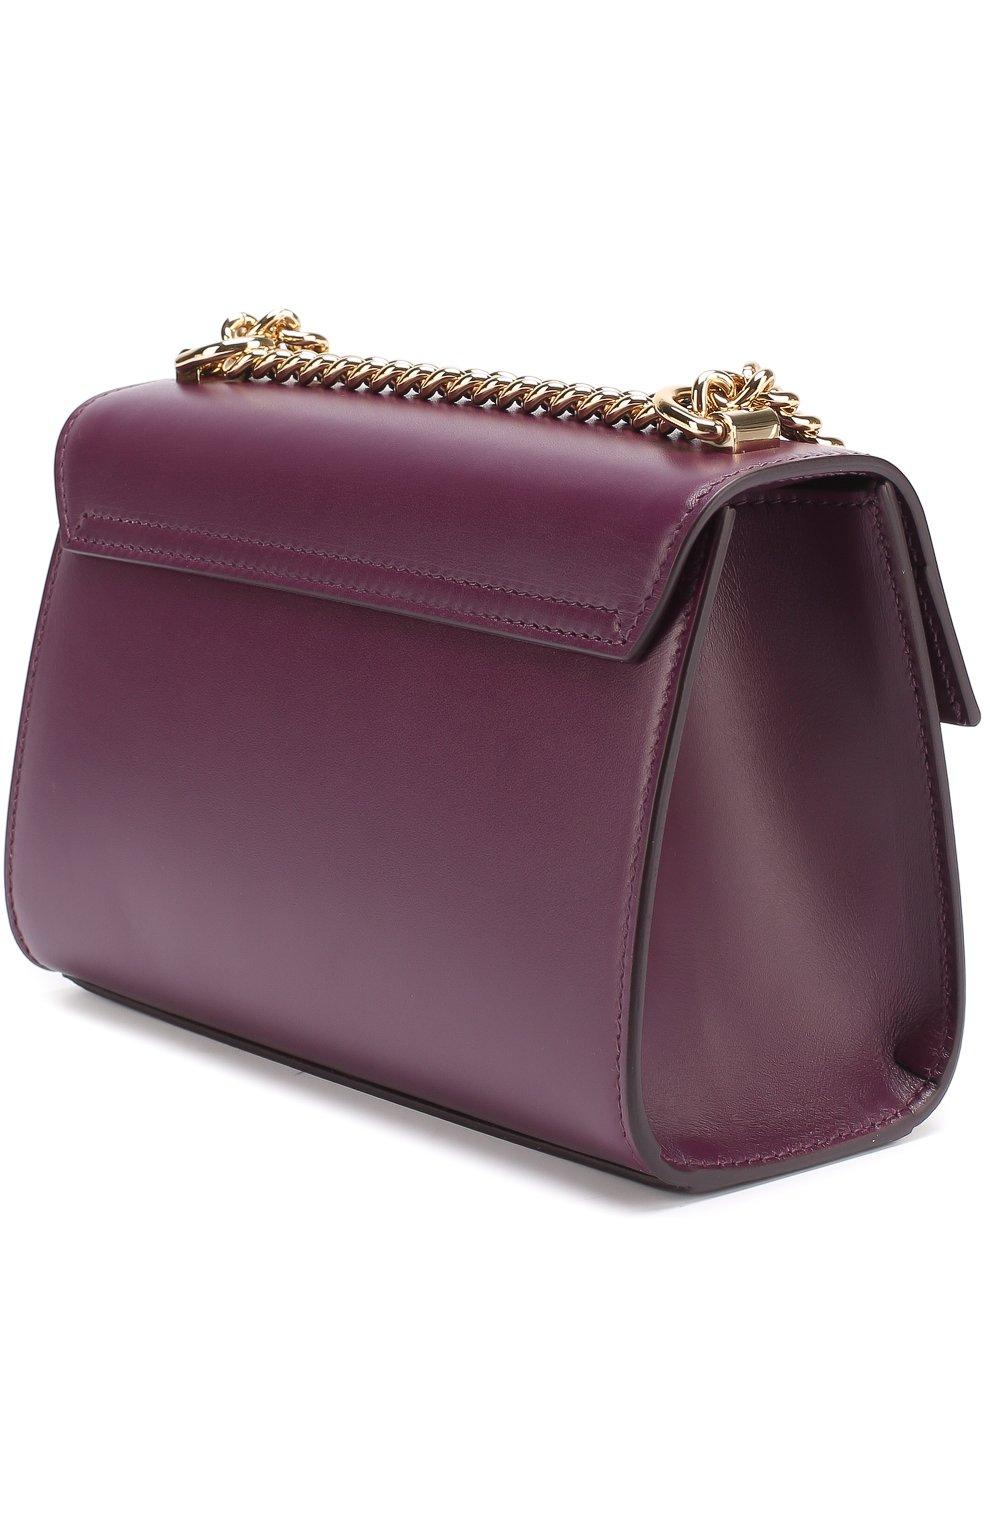 Сумка Lucia Dolce & Gabbana фиолетовая цвета | Фото №2